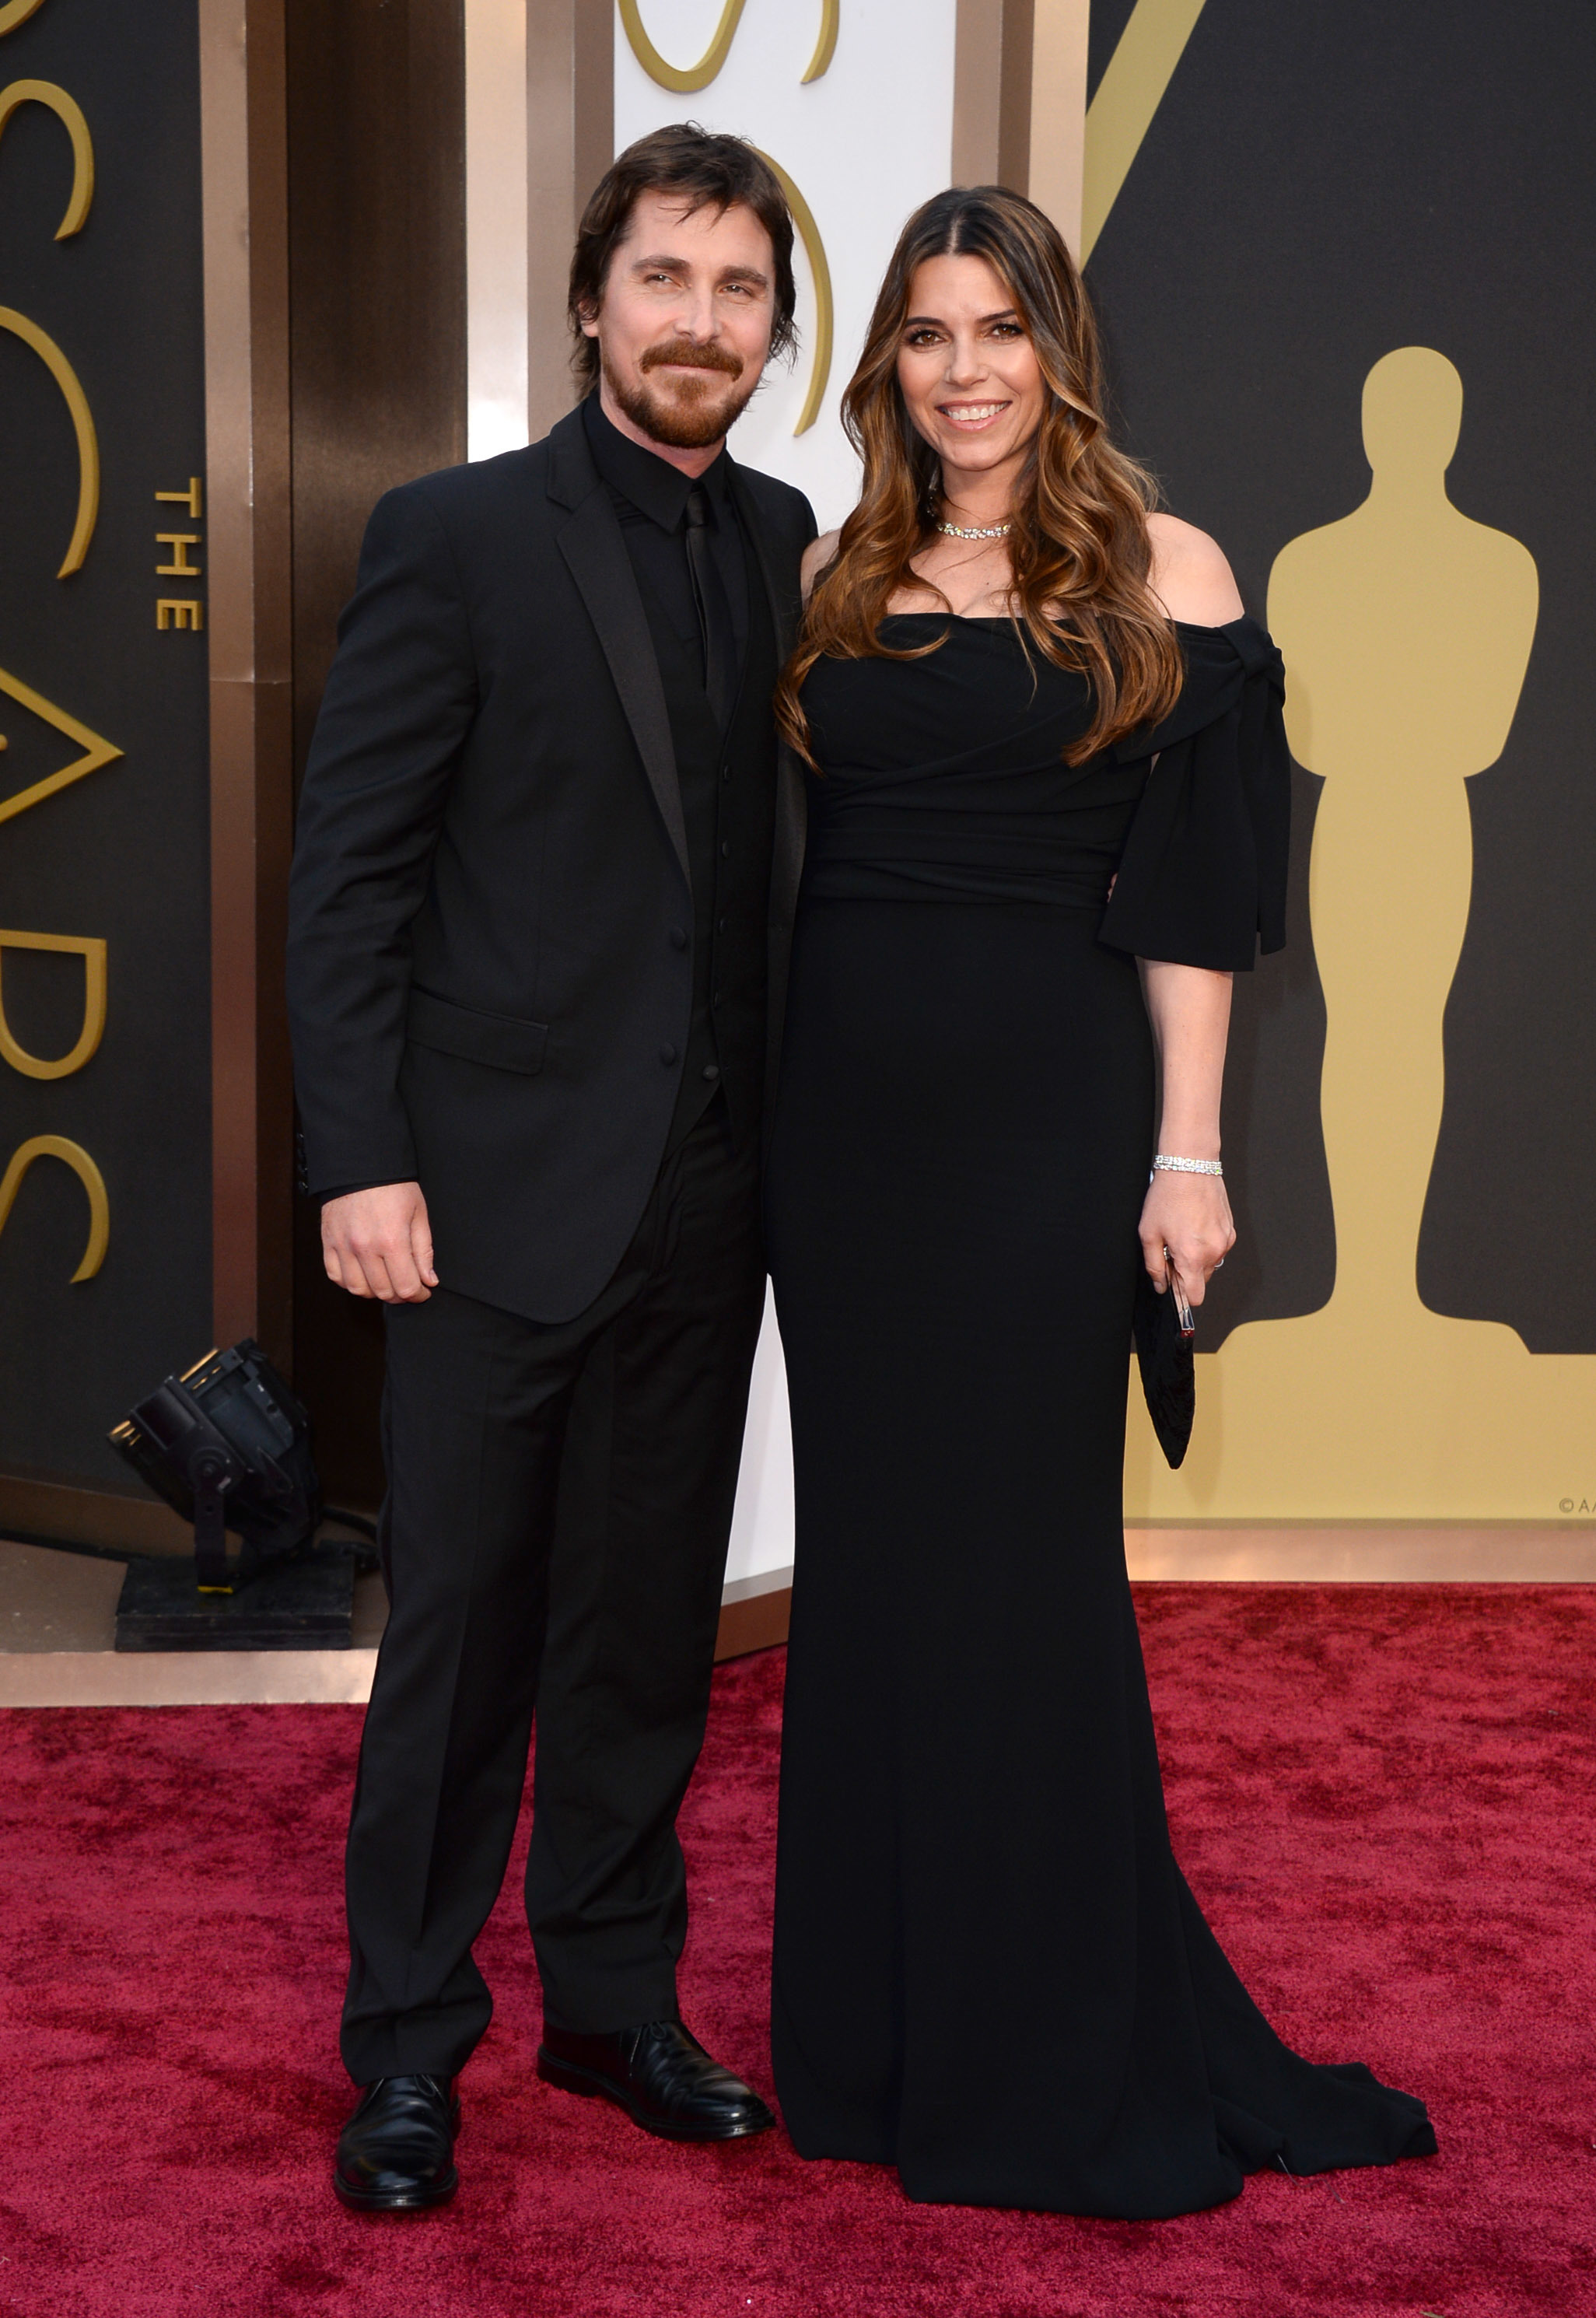 Christian Bale Sibi Blazic Oscars 2014